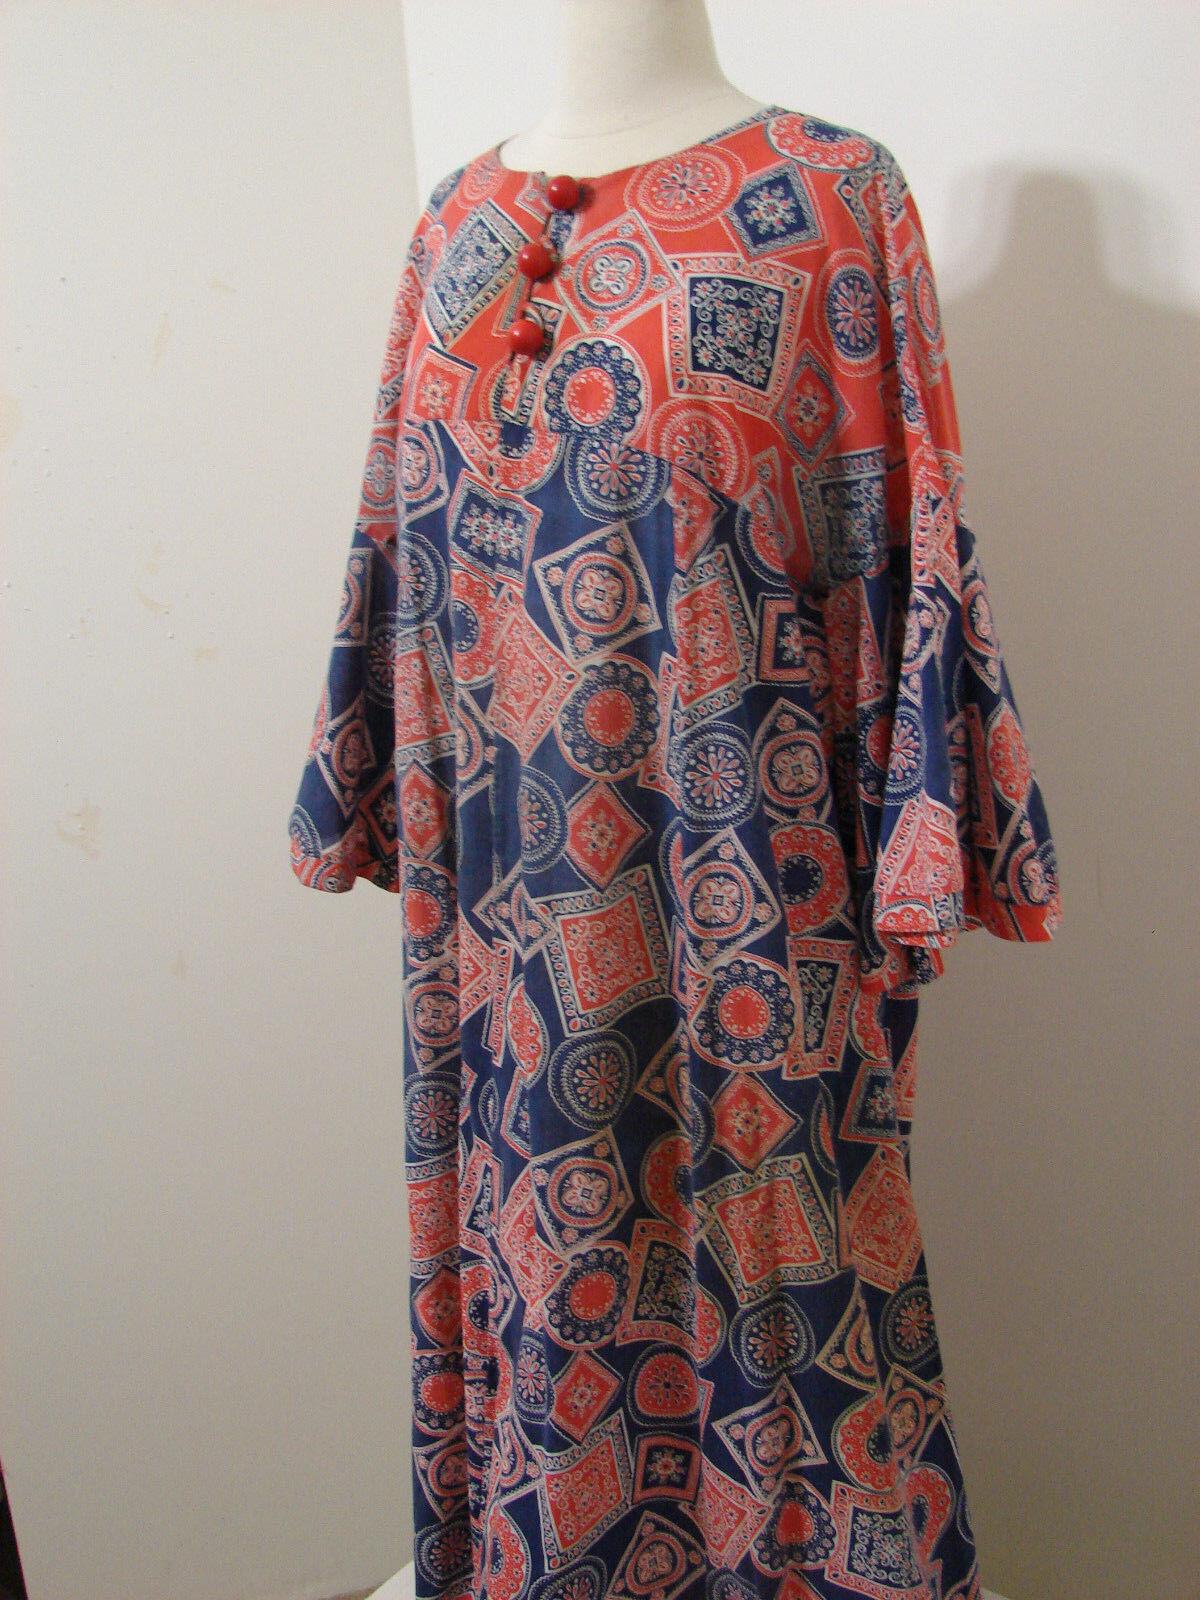 PEGGY LOU Caftan Dress Vintage 1960's Groovy Patc… - image 5